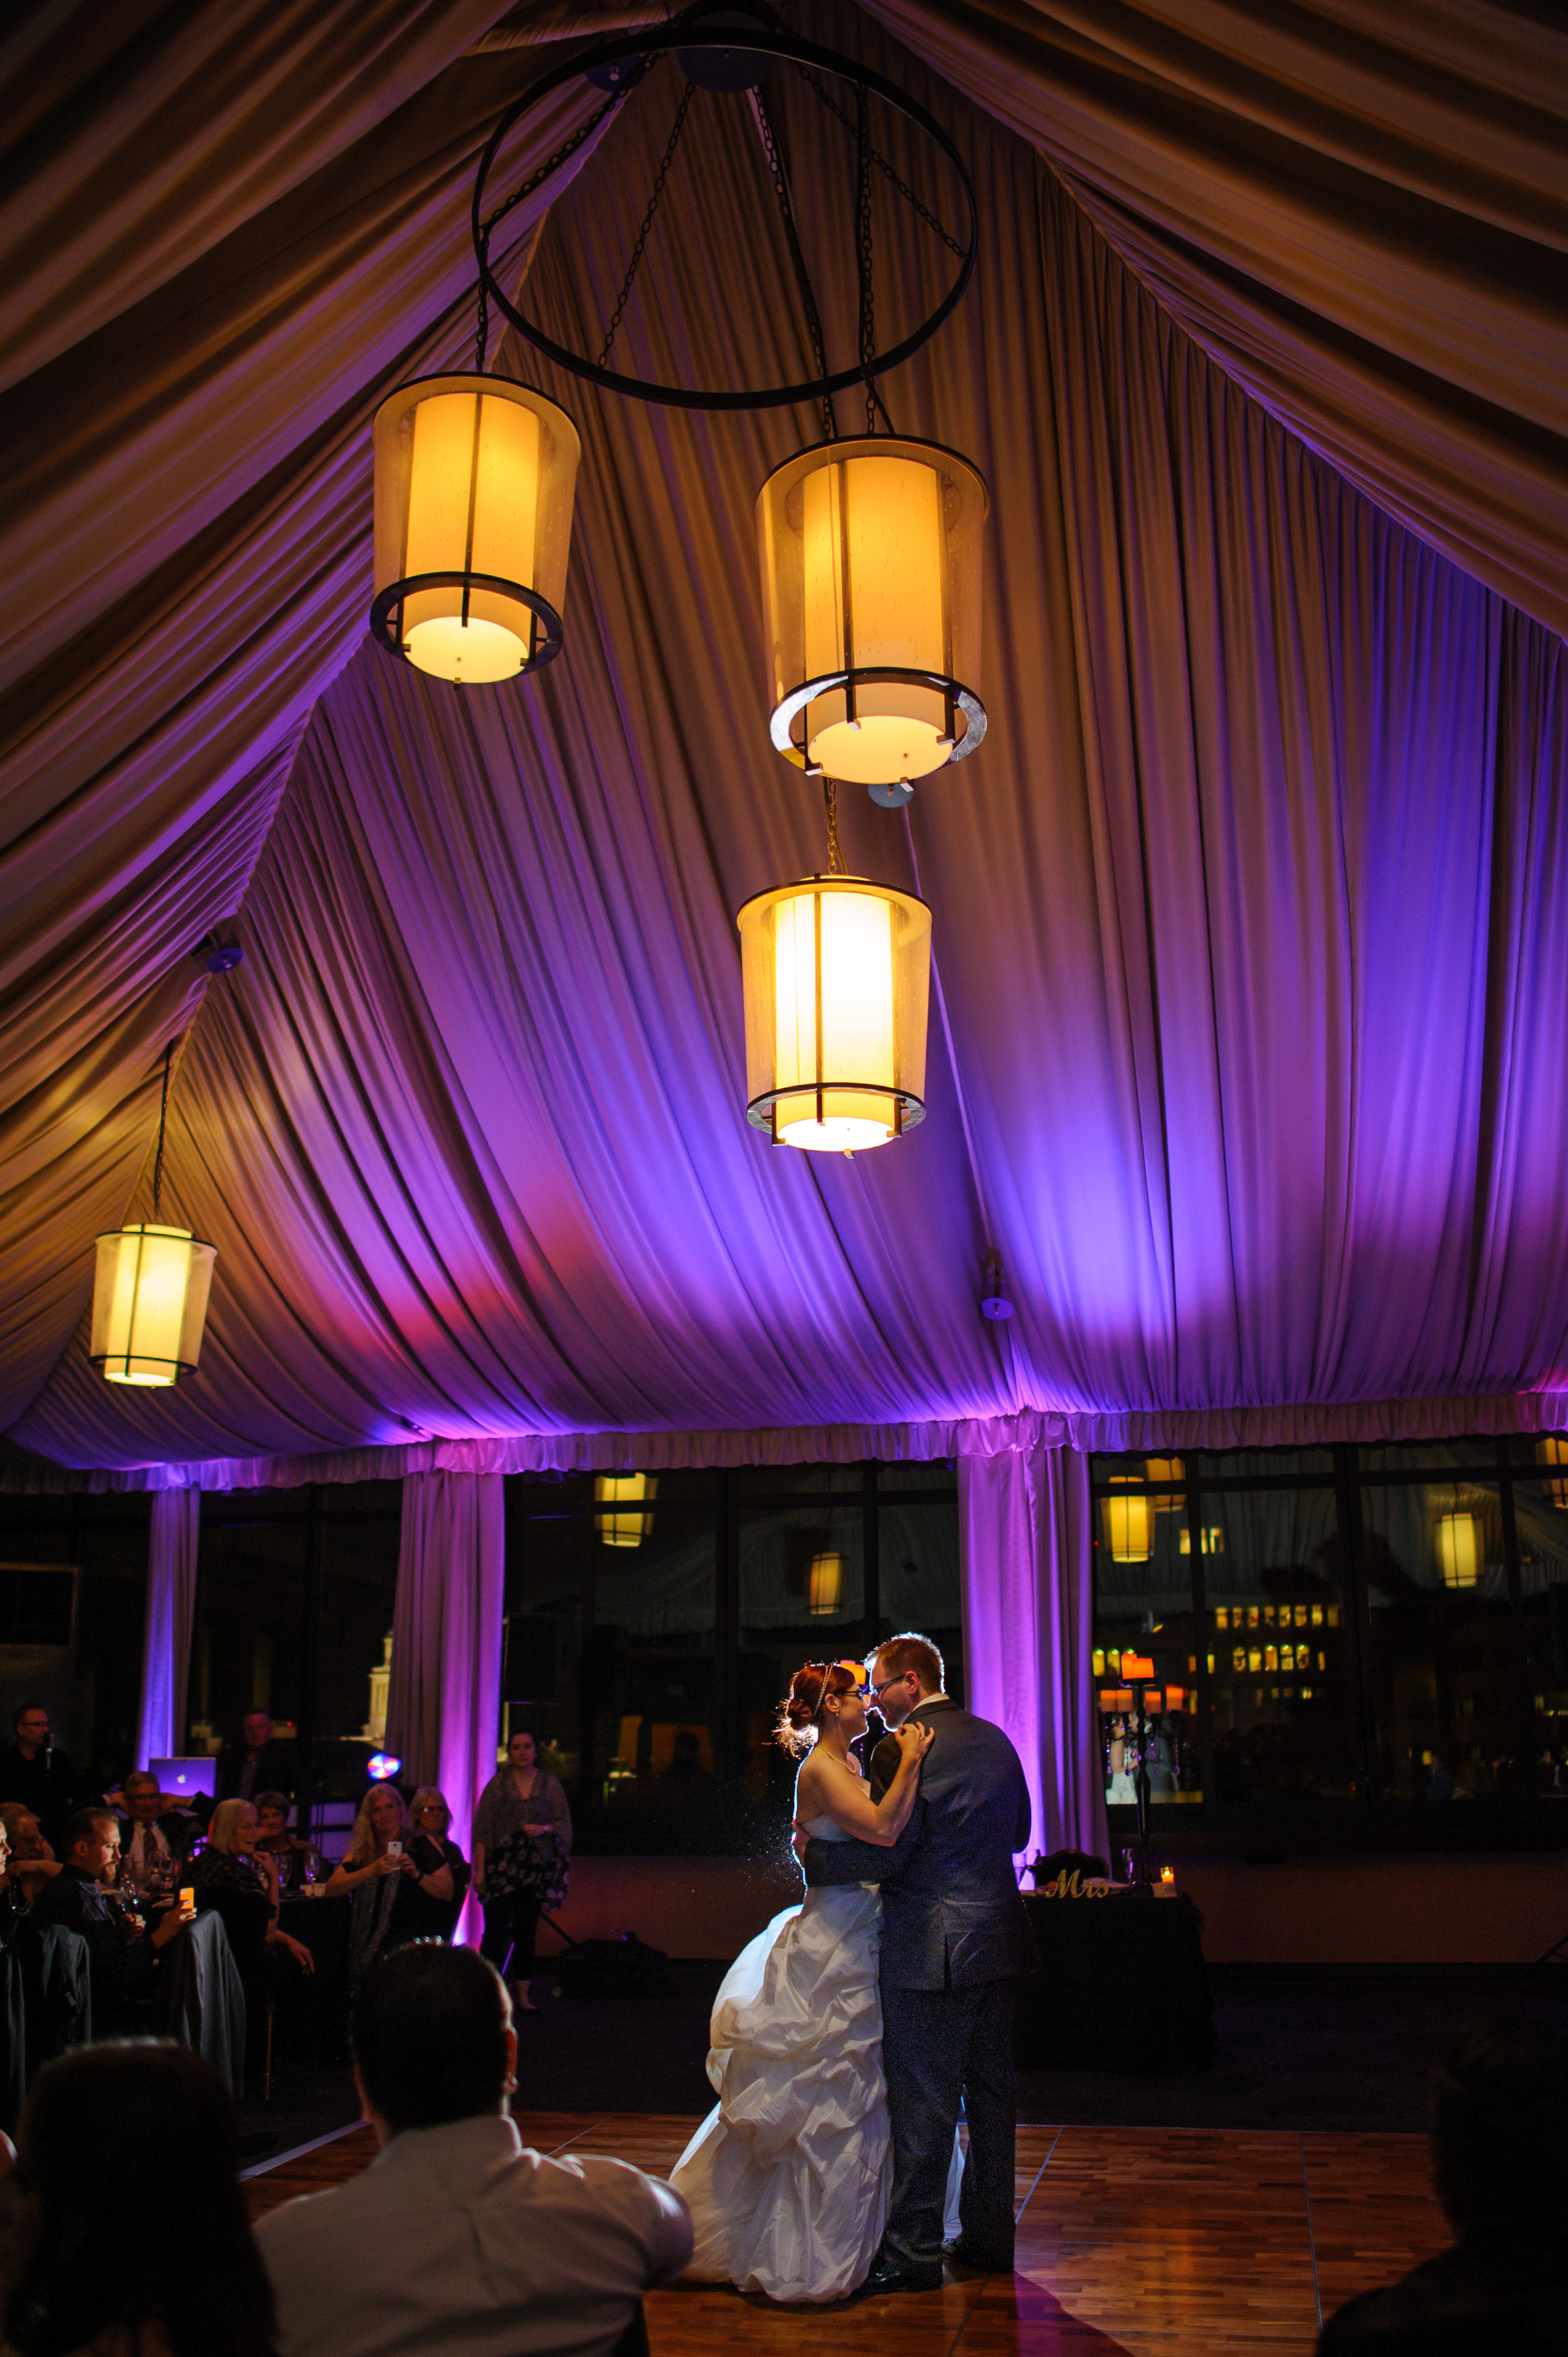 judith-john-012-citizen-hotel-sacramento-wedding-photographer-katherine-nicole-photography.JPG